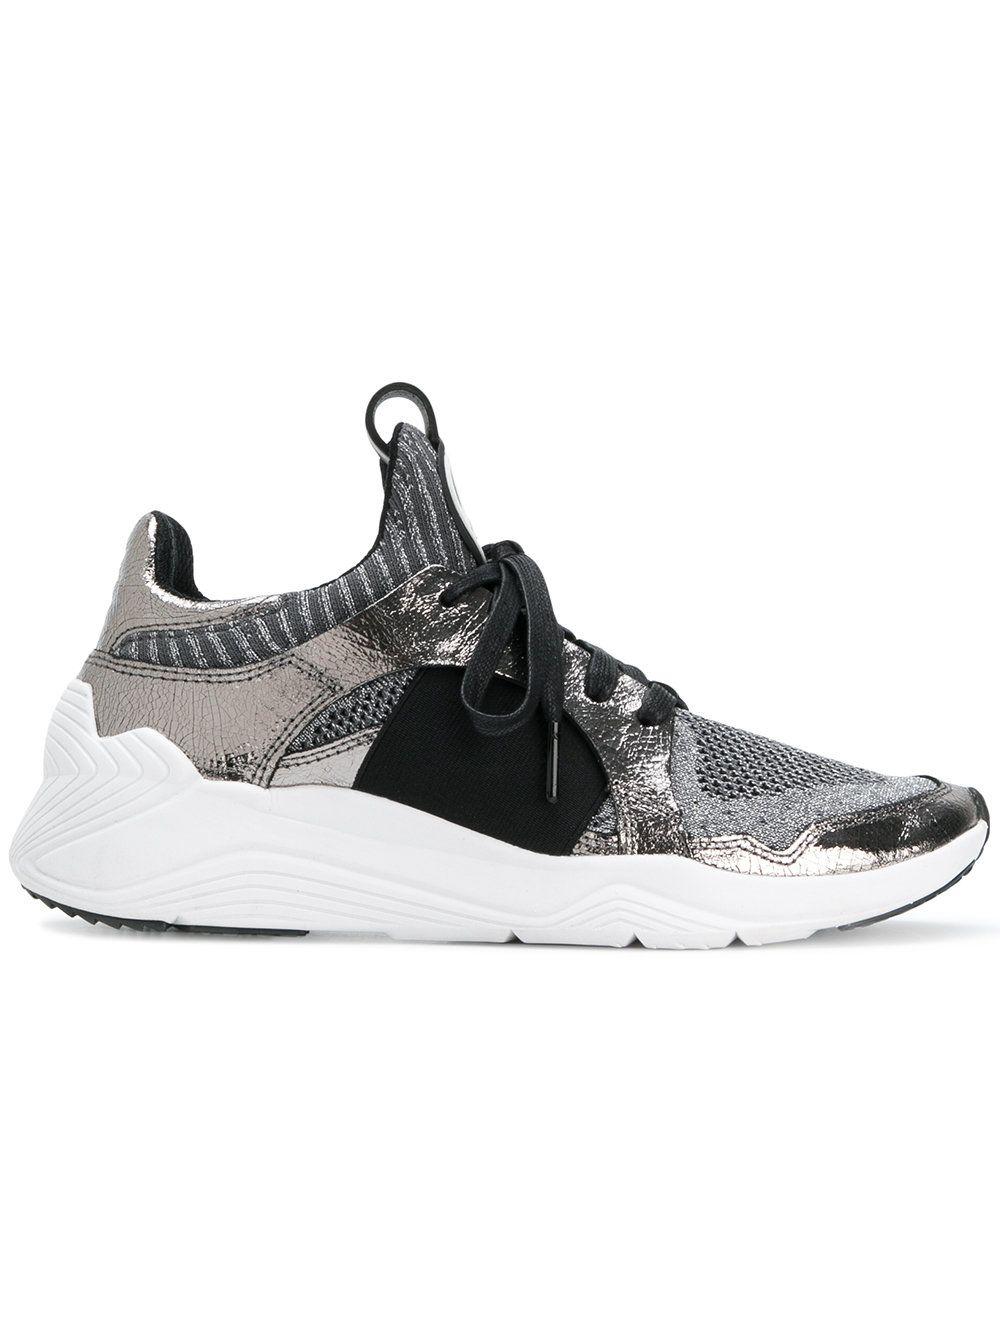 Alexander McQueen Black Kalsee Scuba Sneakers 8AAJZF4WtX